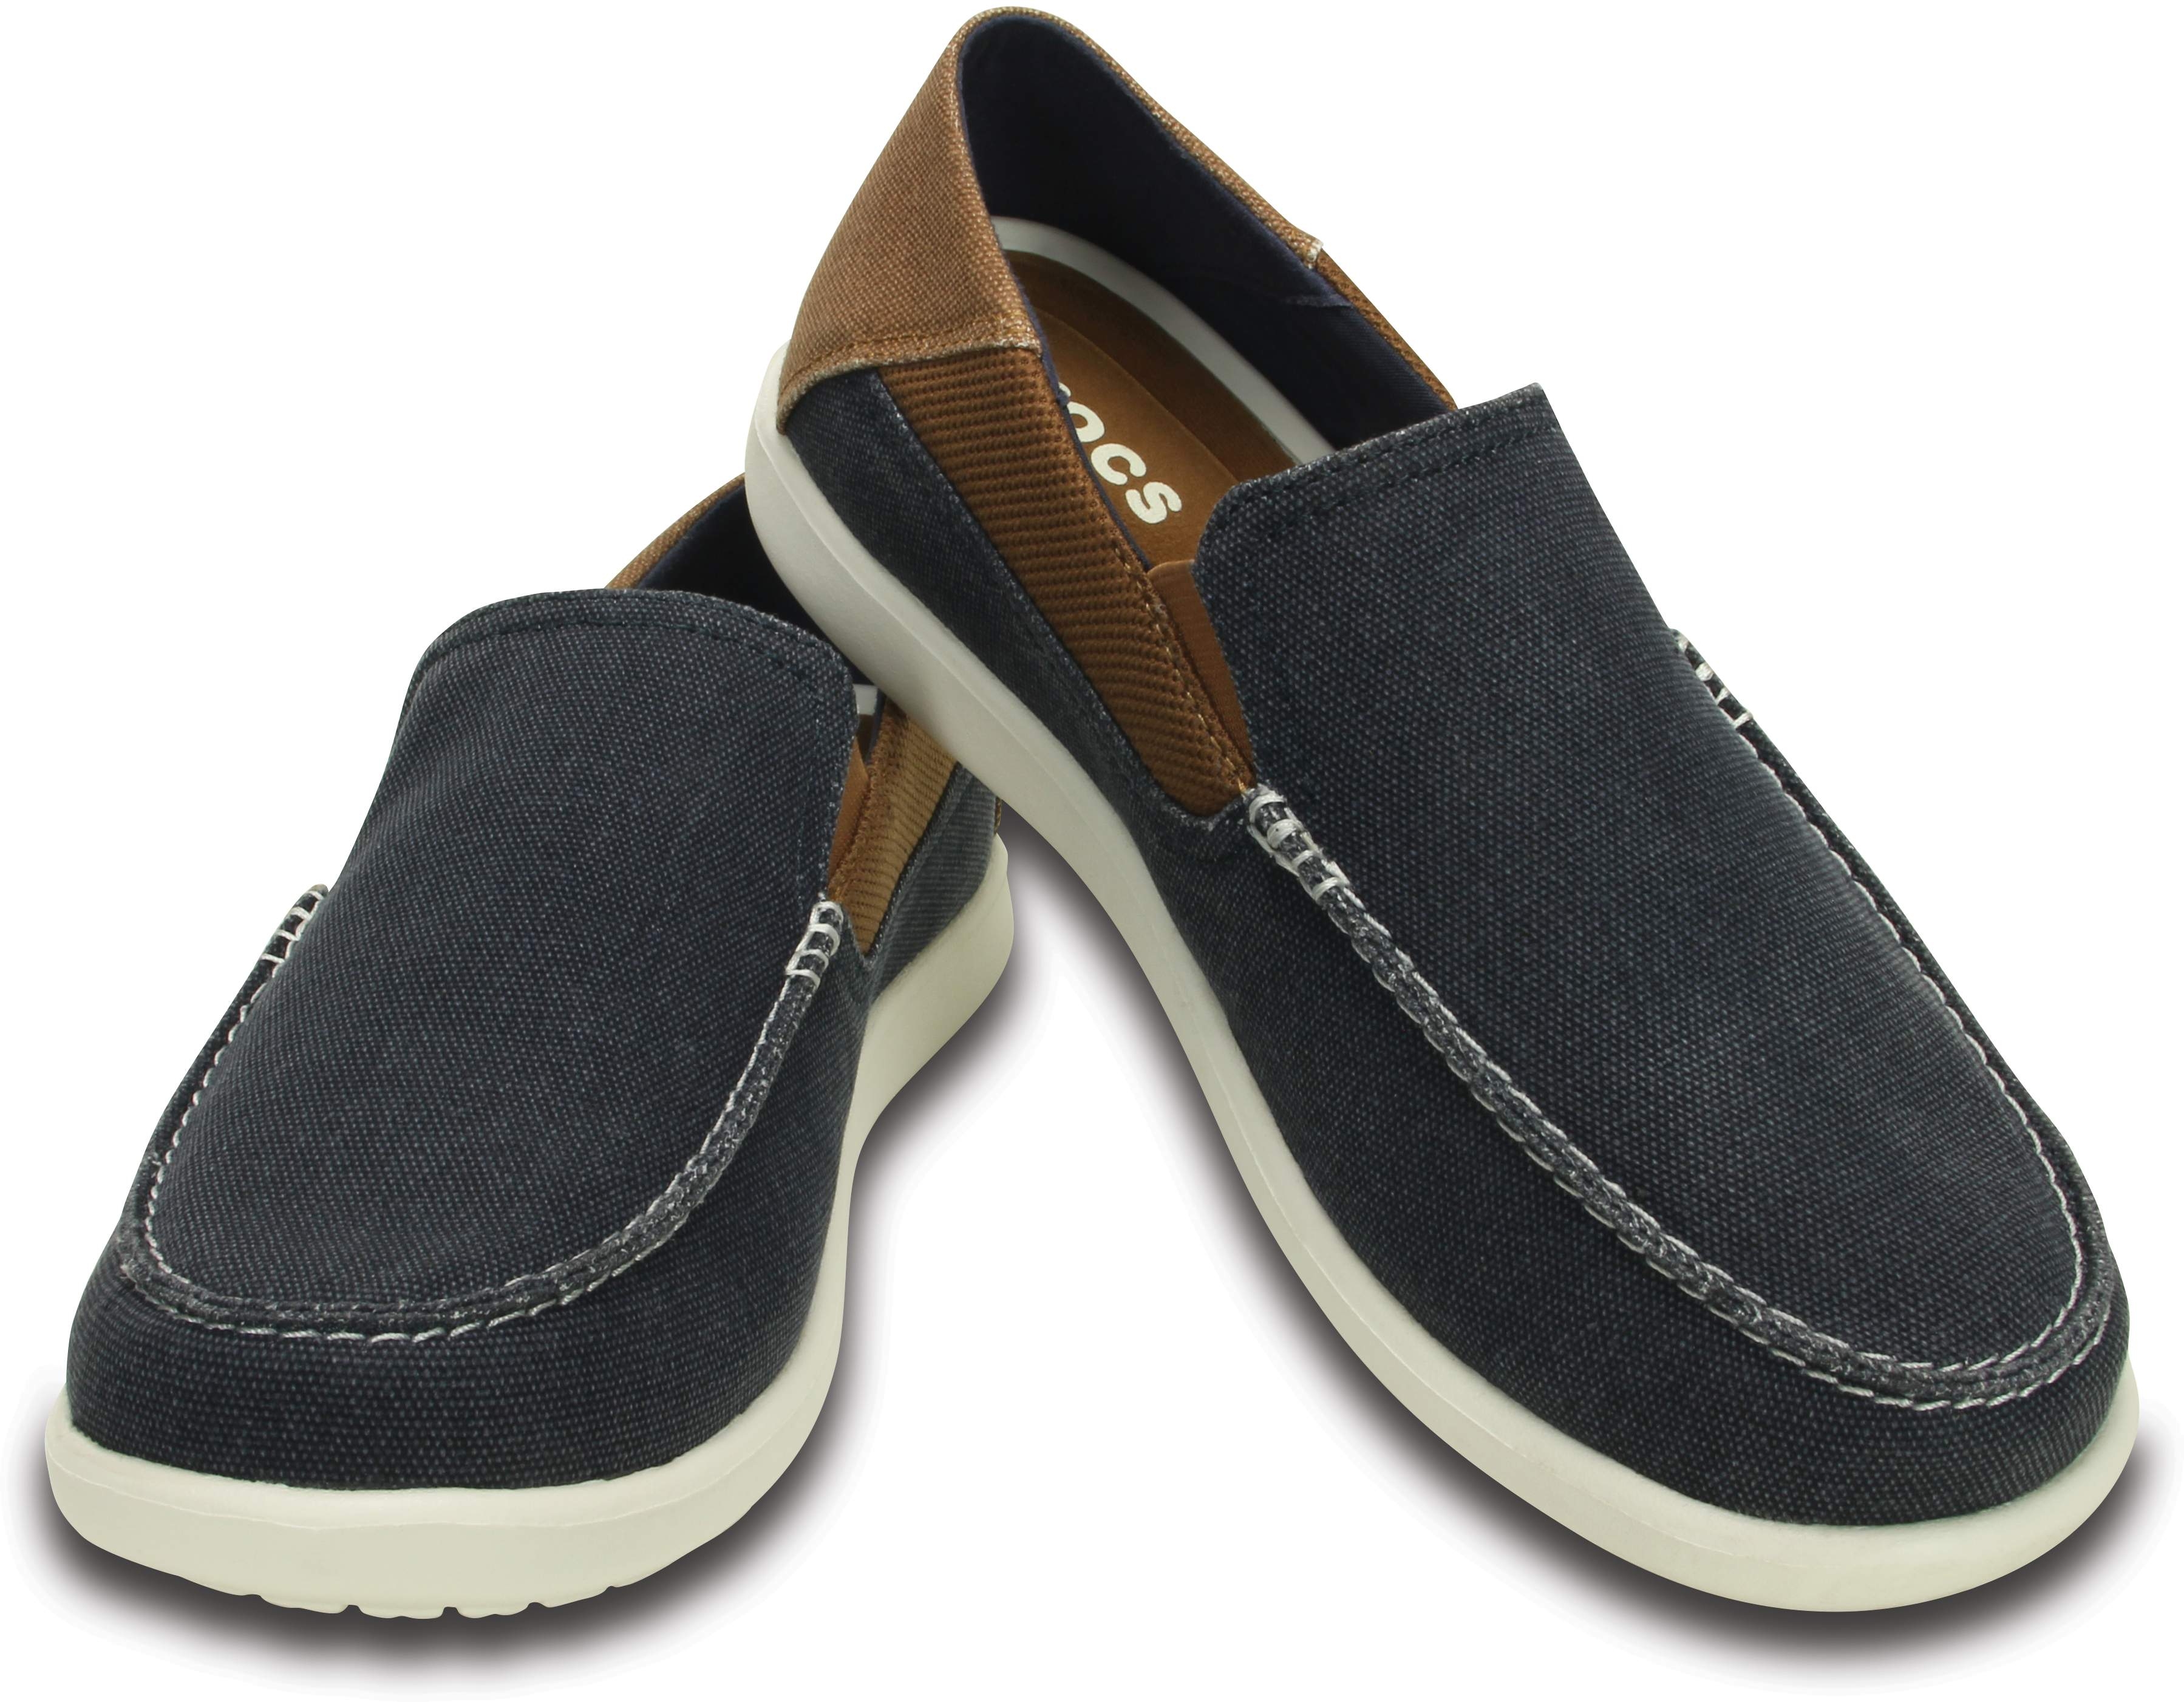 Crocs Men's Santa Cruz 2 Luxe Loafer Navy / Hazelnut 202056-4R9